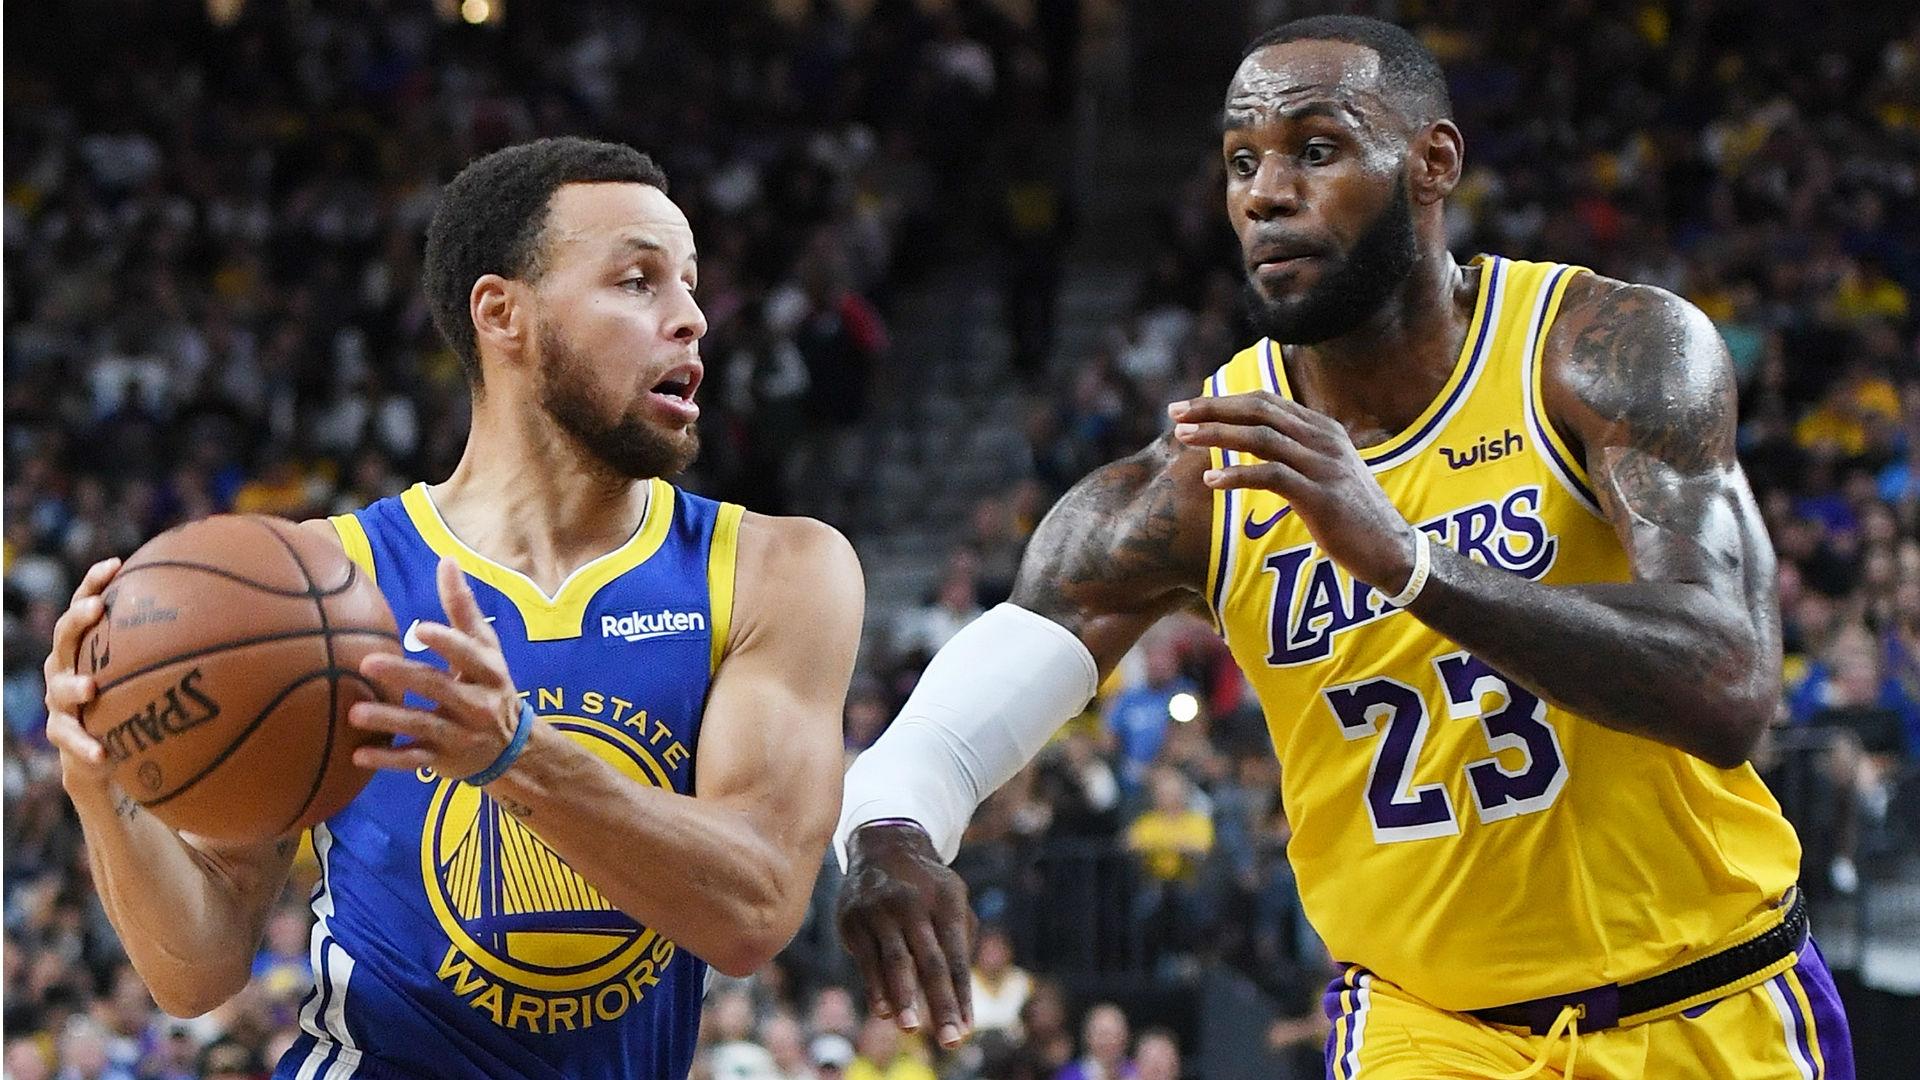 LeBron Steph Basketball Kreedon highest paid sports